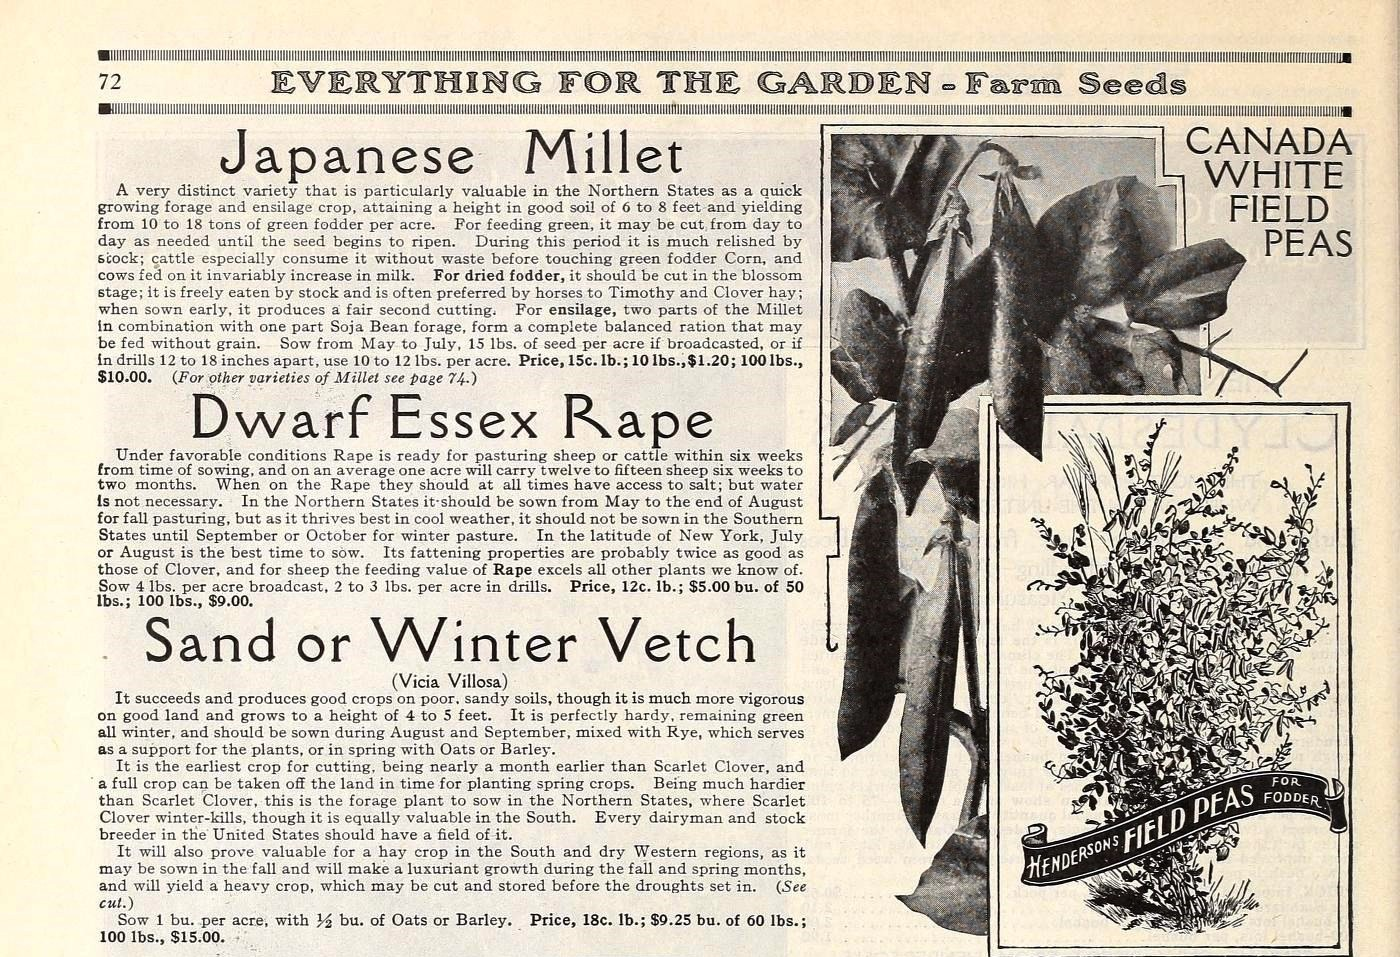 Image select plants